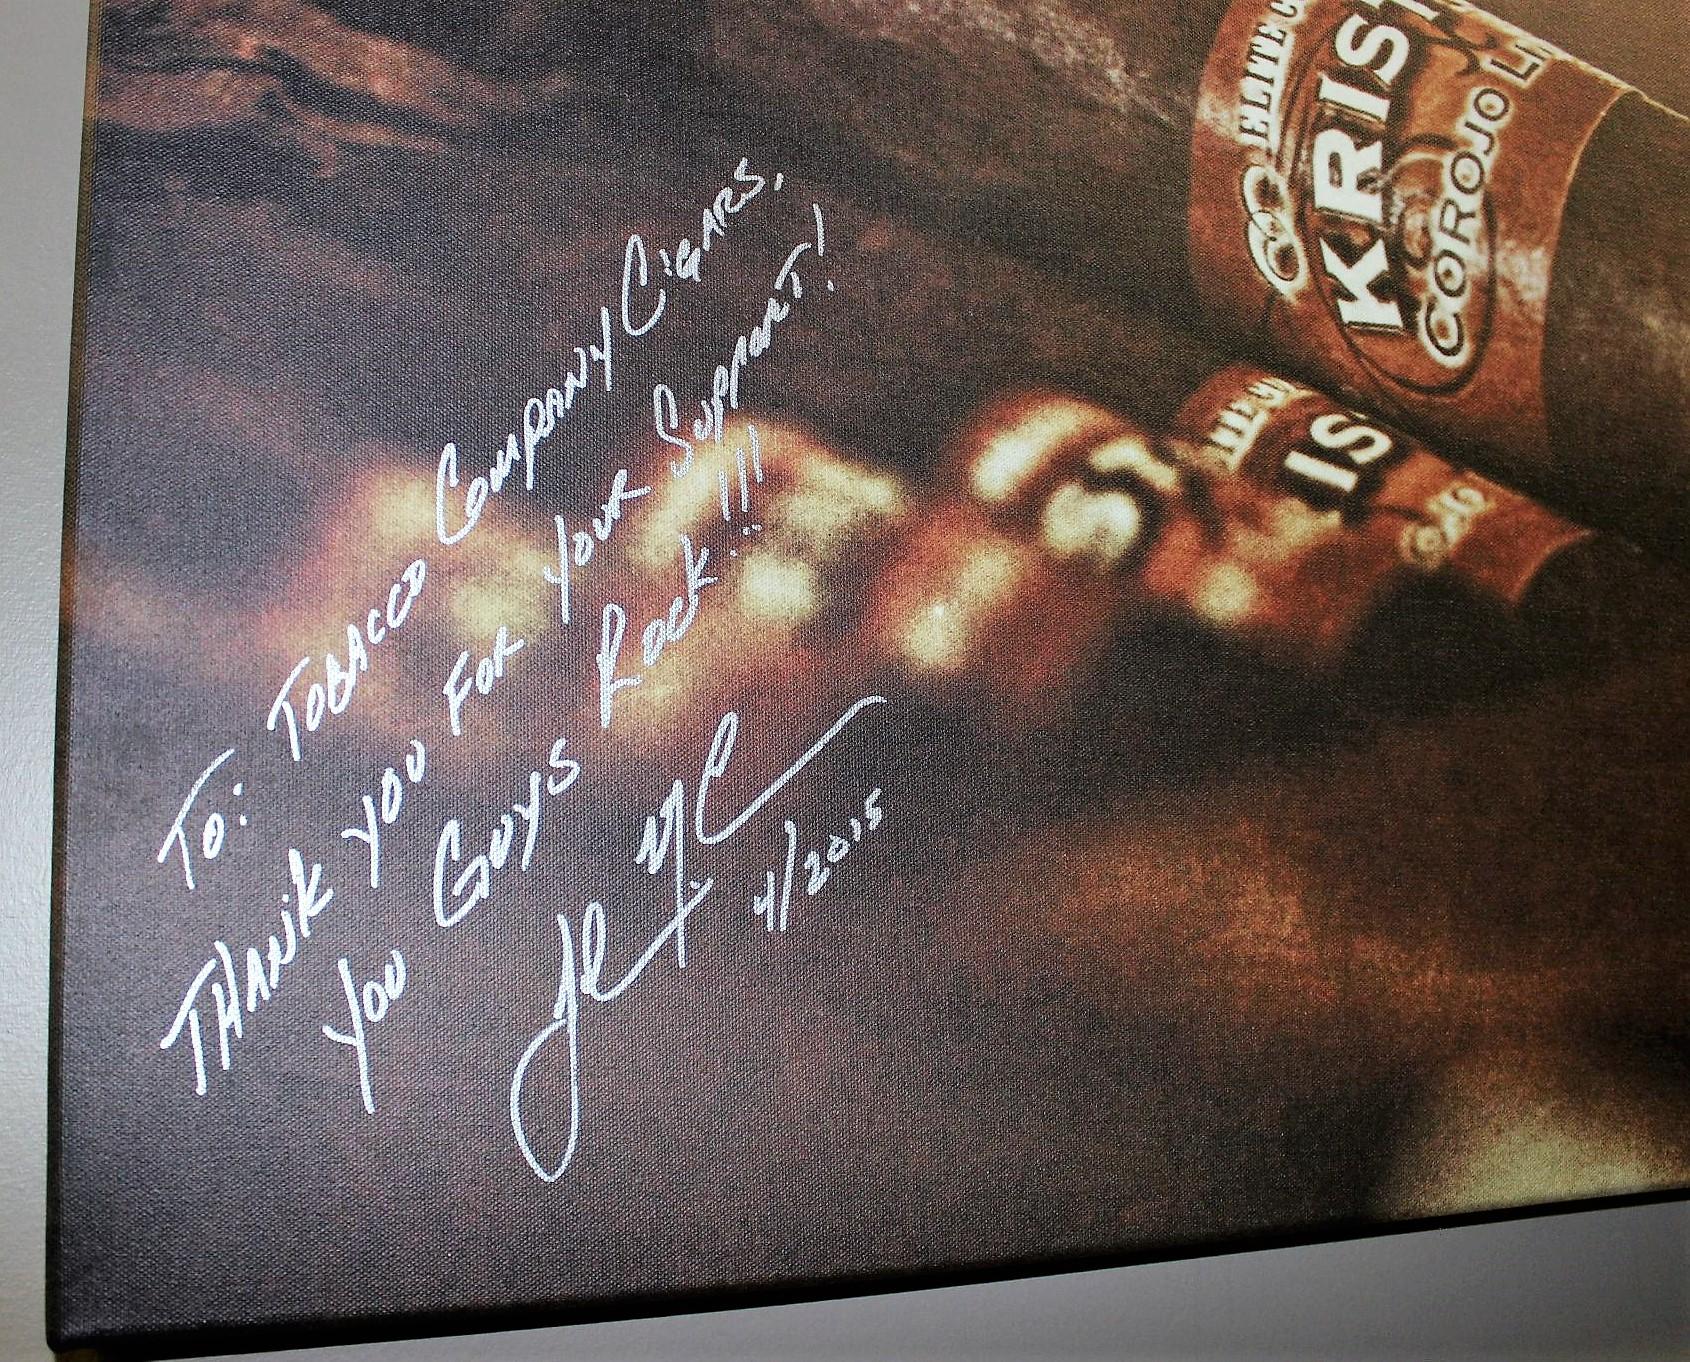 Kristoff Sign off.jpg